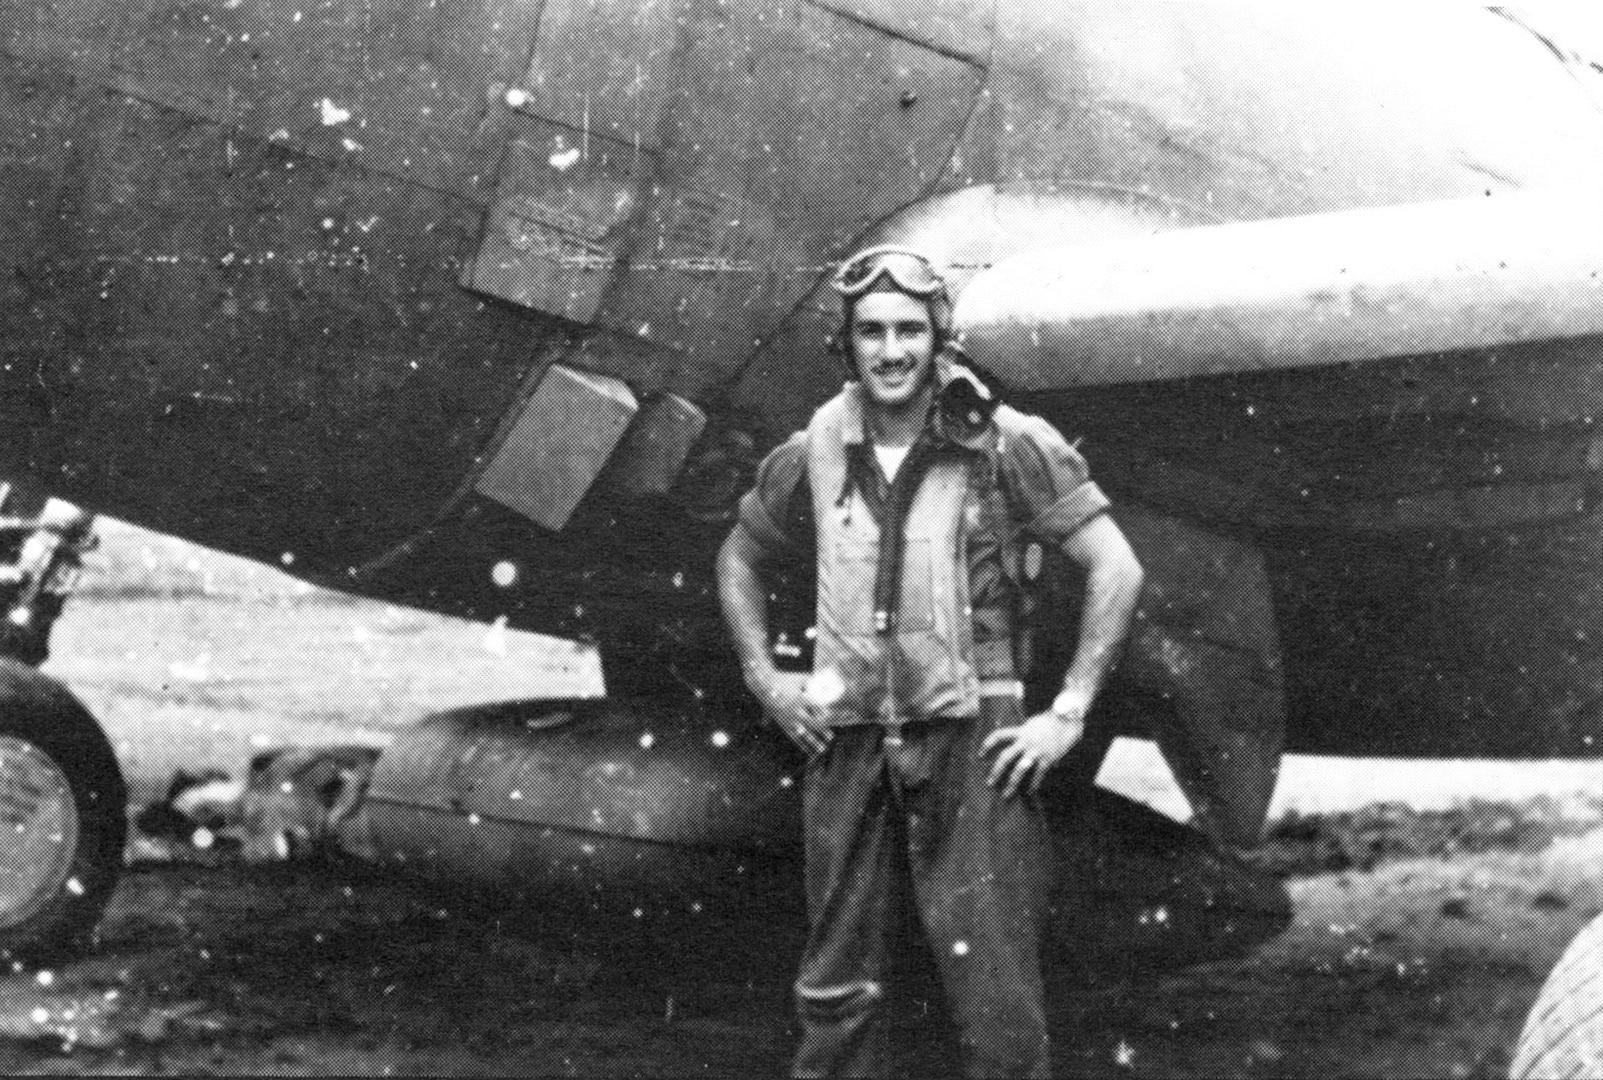 2nd Lt. Marvin B. Rothman